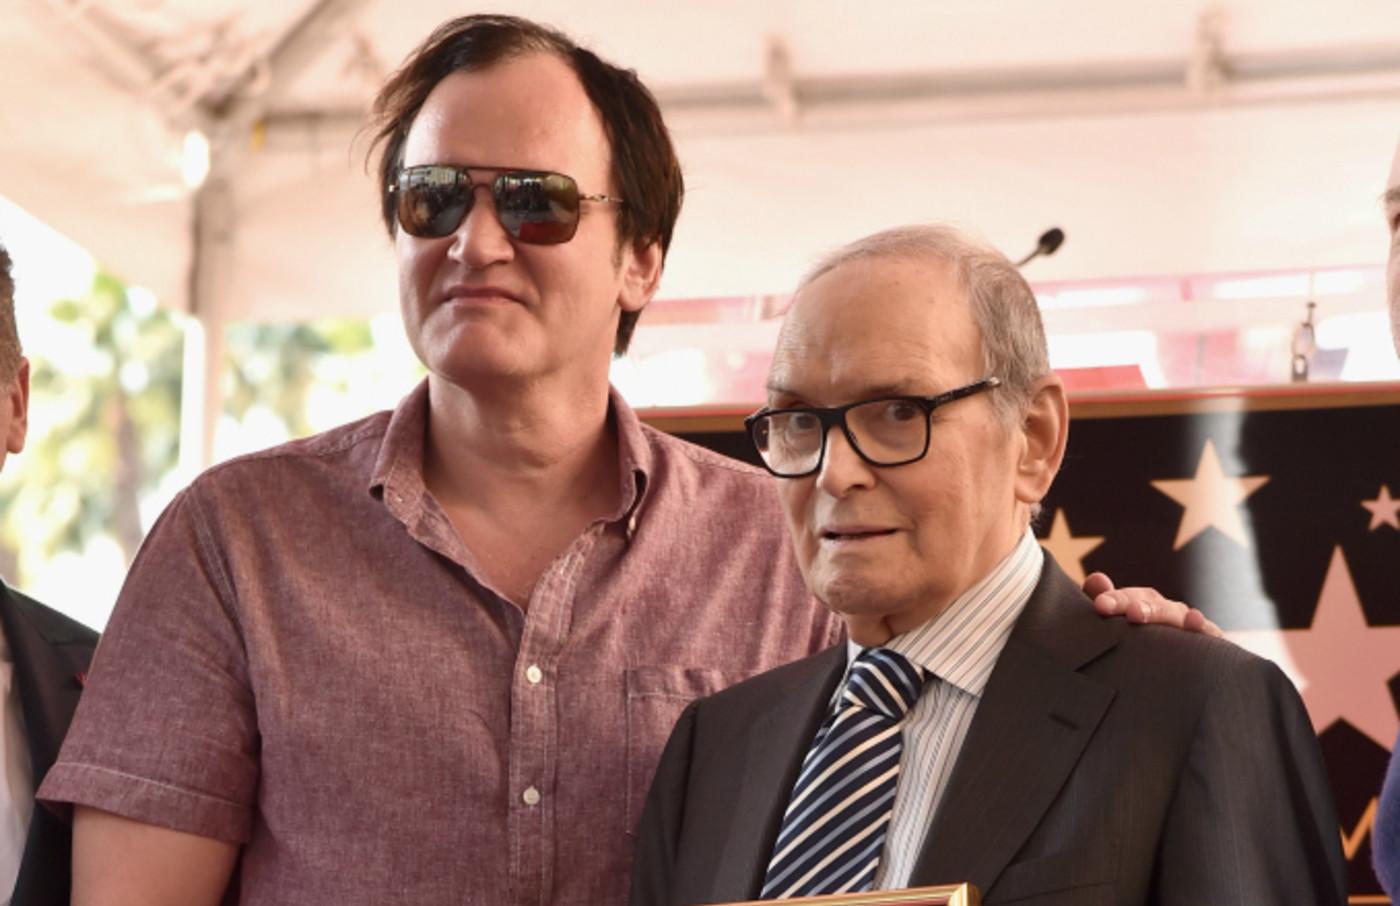 Director Quentin Tarantino and composer Ennio Morricone attend a ceremony honoring Ennio Morricone